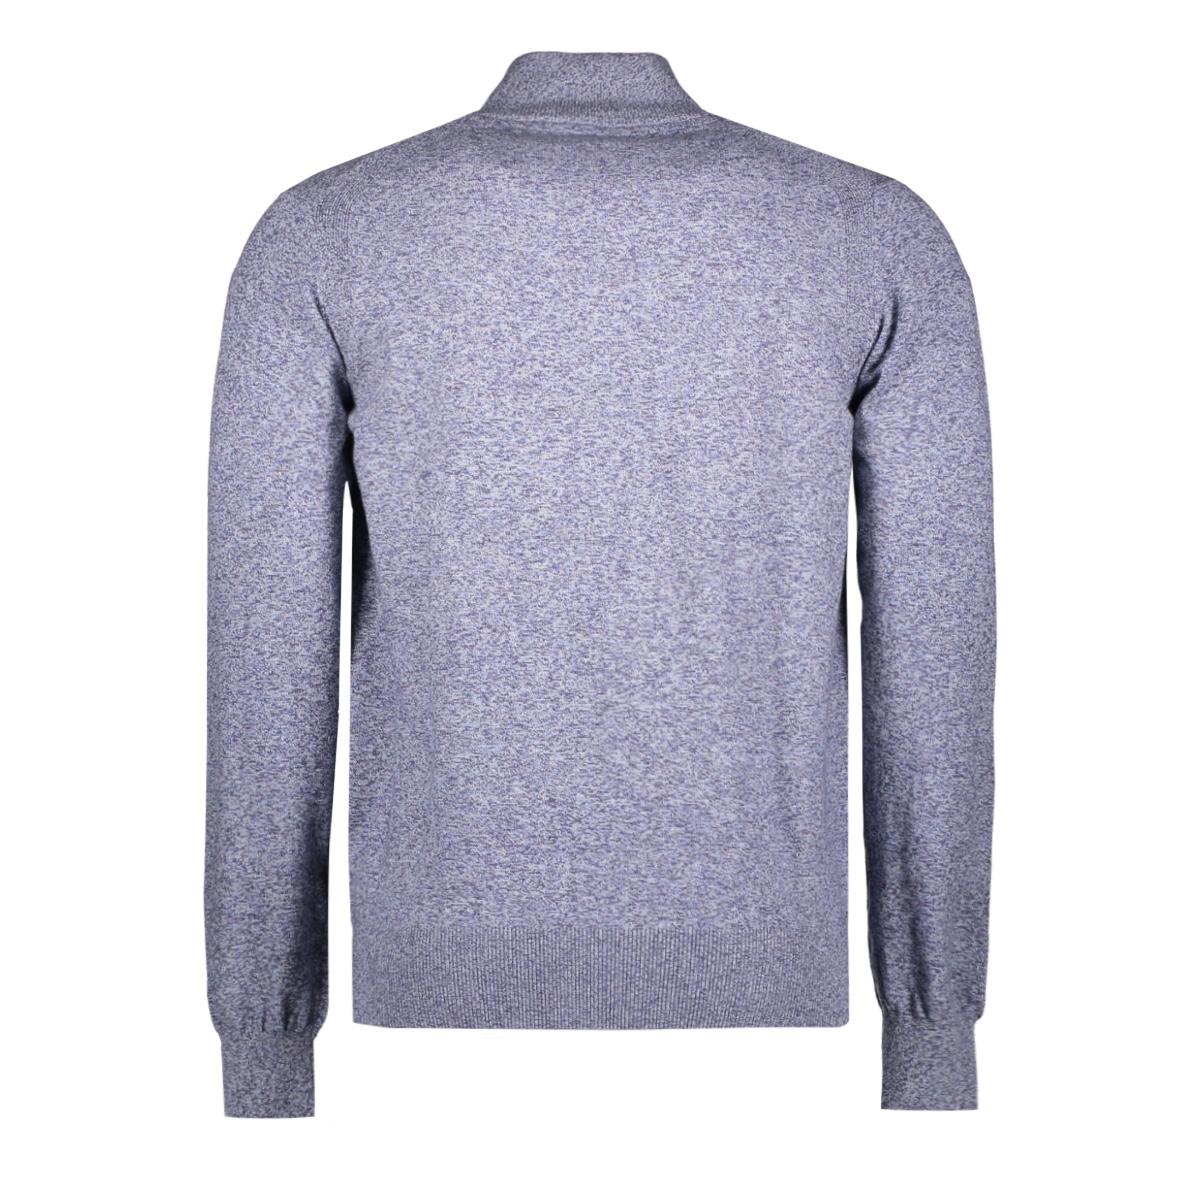 161-37061 bluefields vest 5965